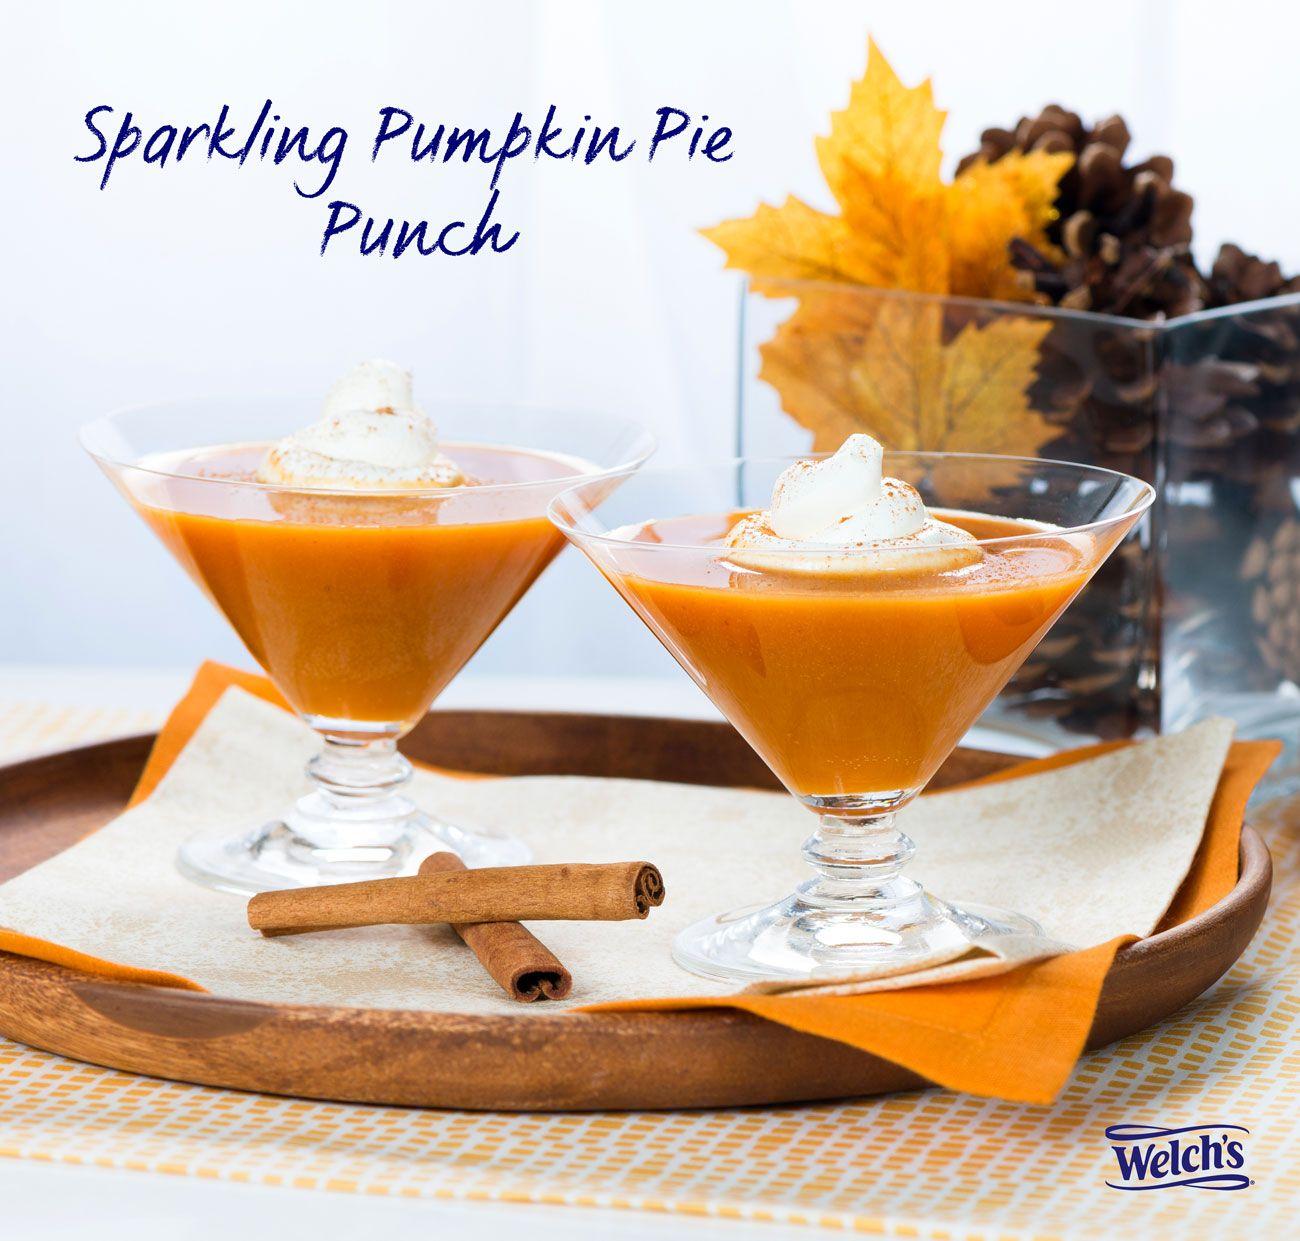 Sparkling Pumpkin Pie Punch Made With Welch's Sparkling